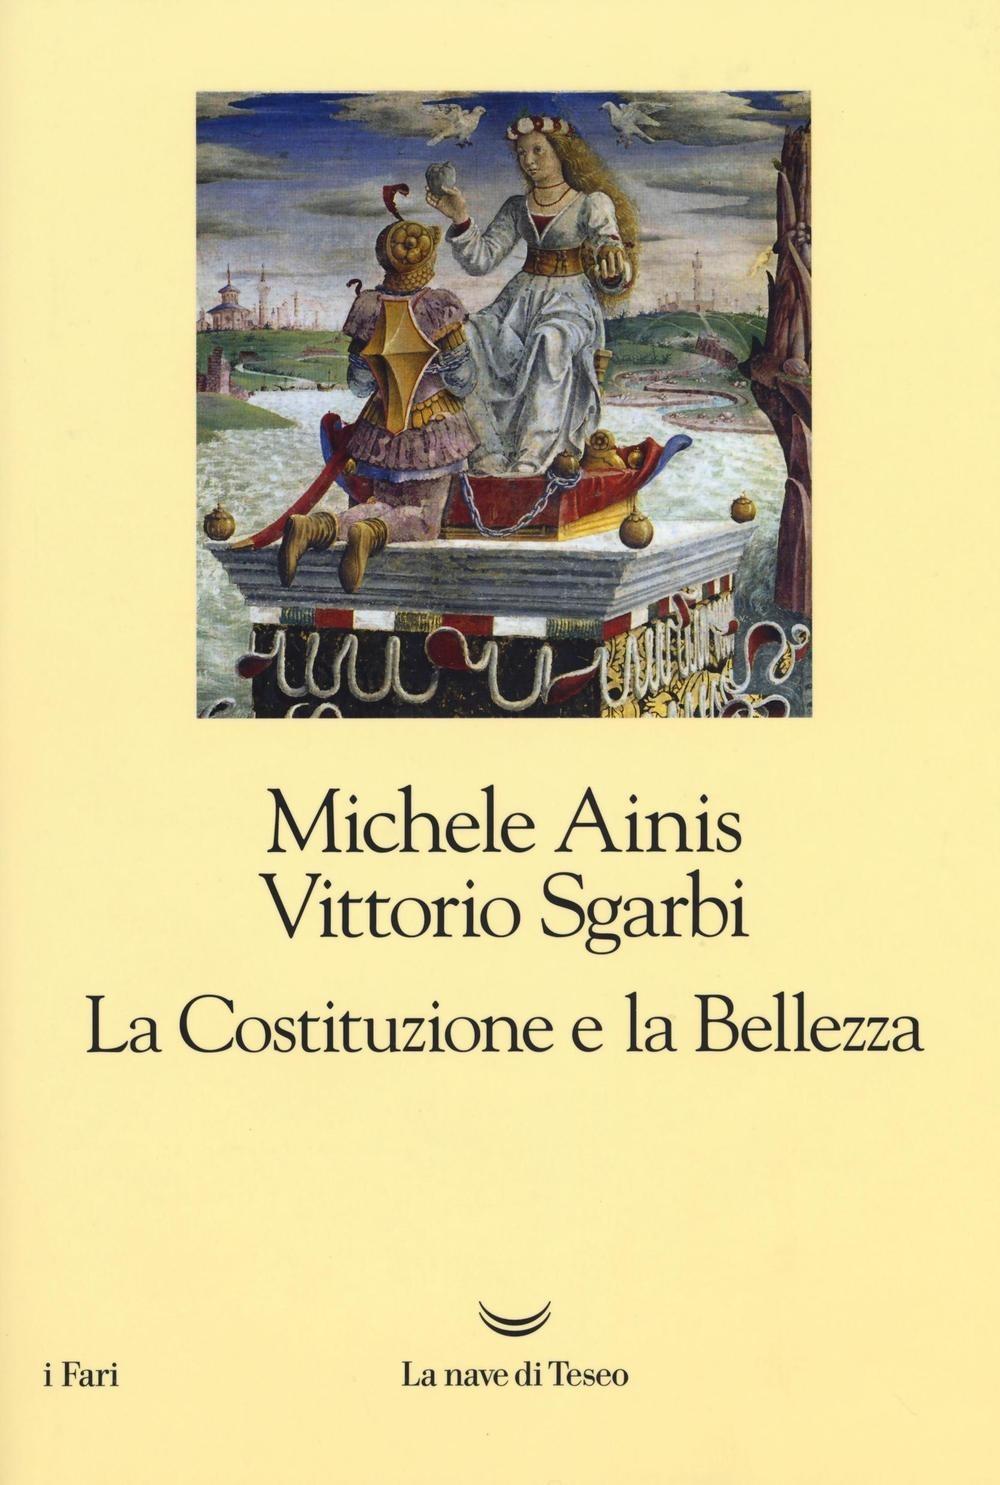 Michele Ainis